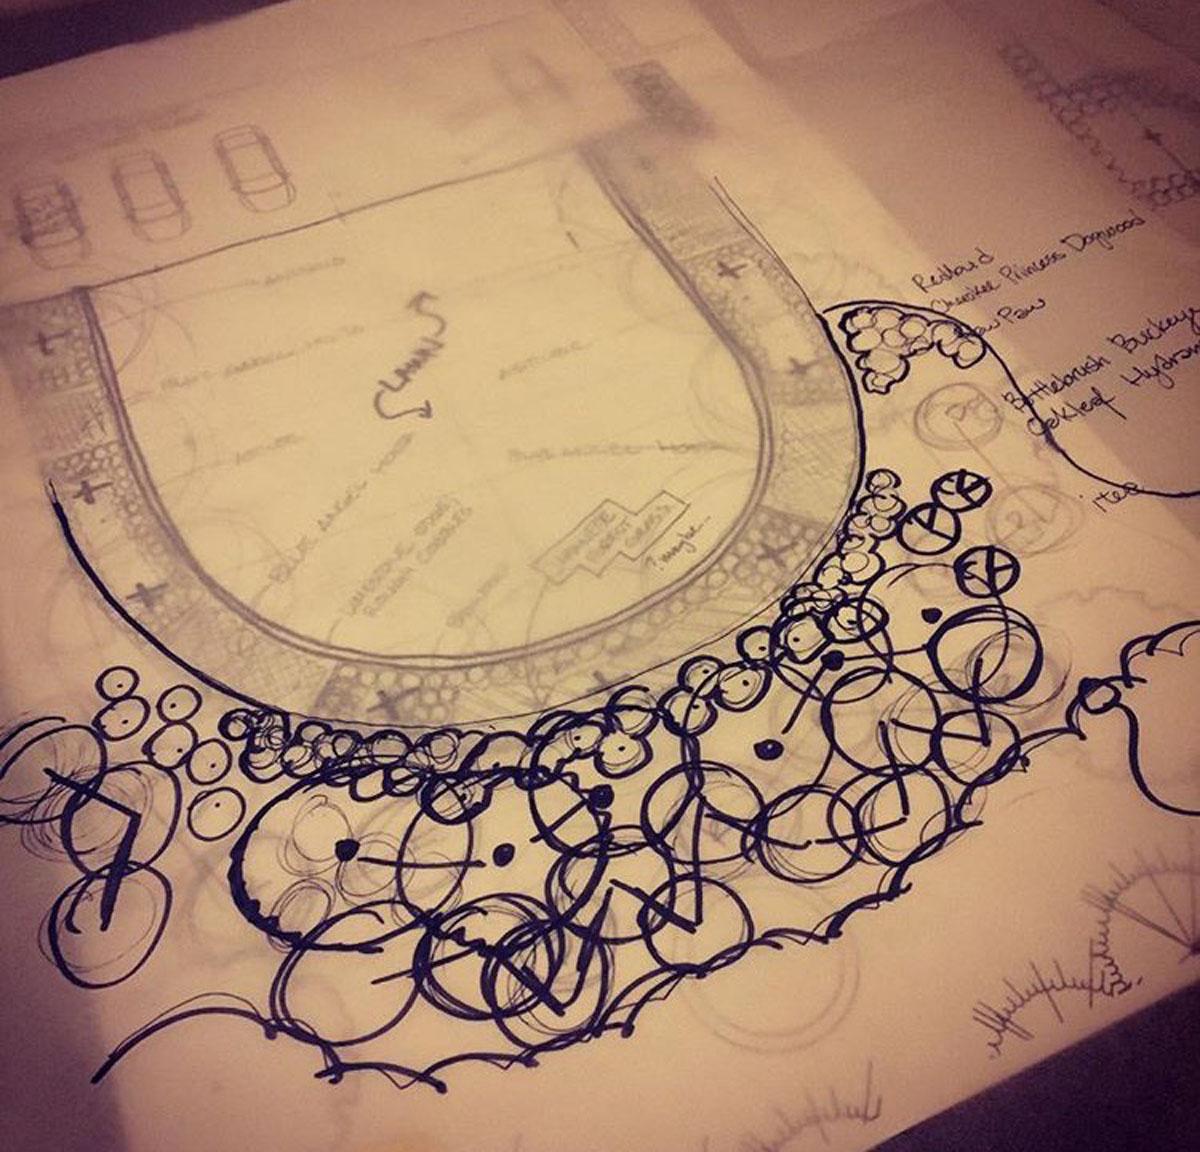 design_sketch_planting_sharpie_marker.jpg